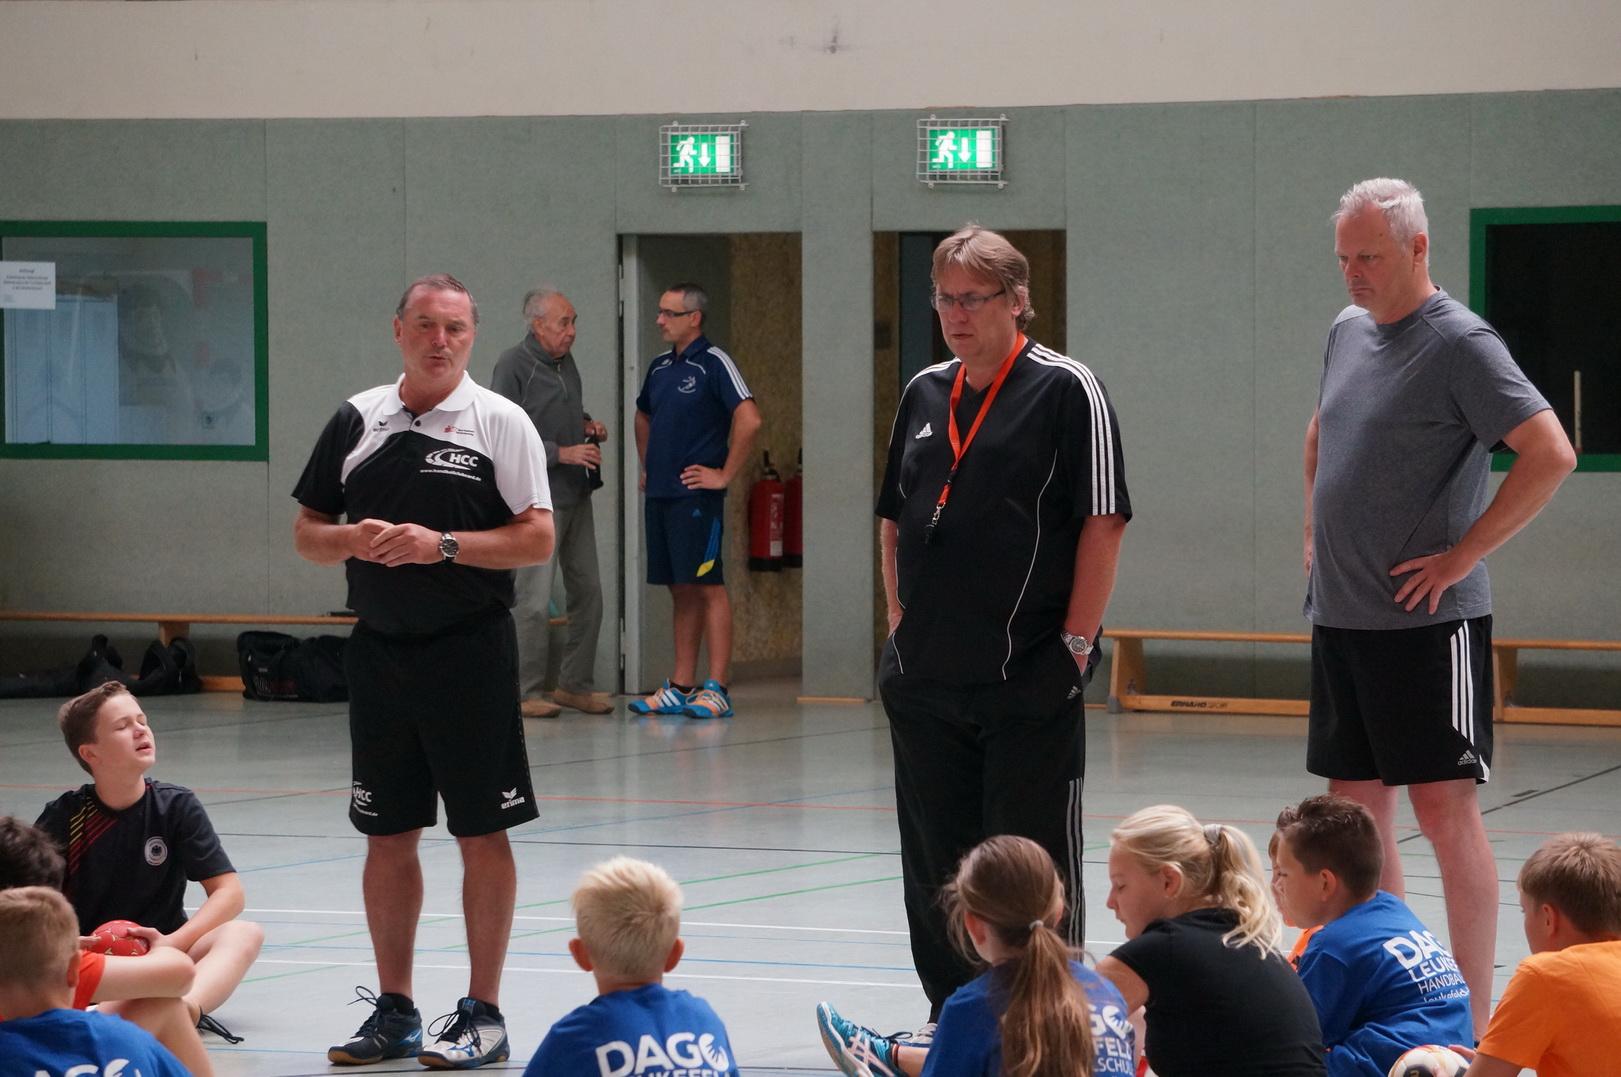 201808_Handballcamp_SDH_MG_144w